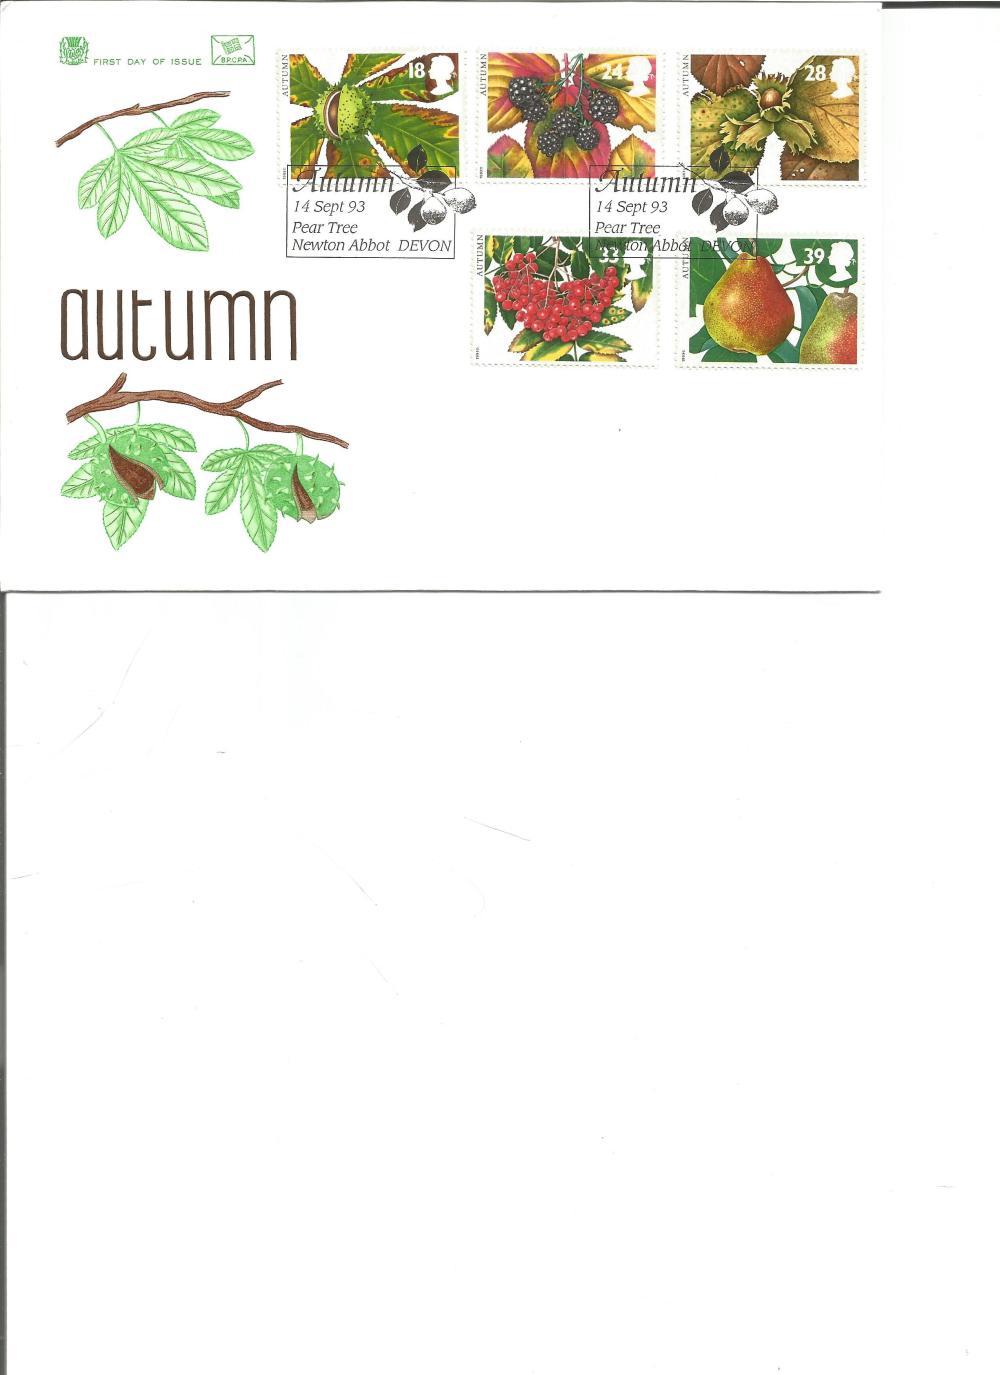 FDC Autumn c/w set of five commemorative stamps double PM Autumn 14 Sept 93 Pear Tree , Newton